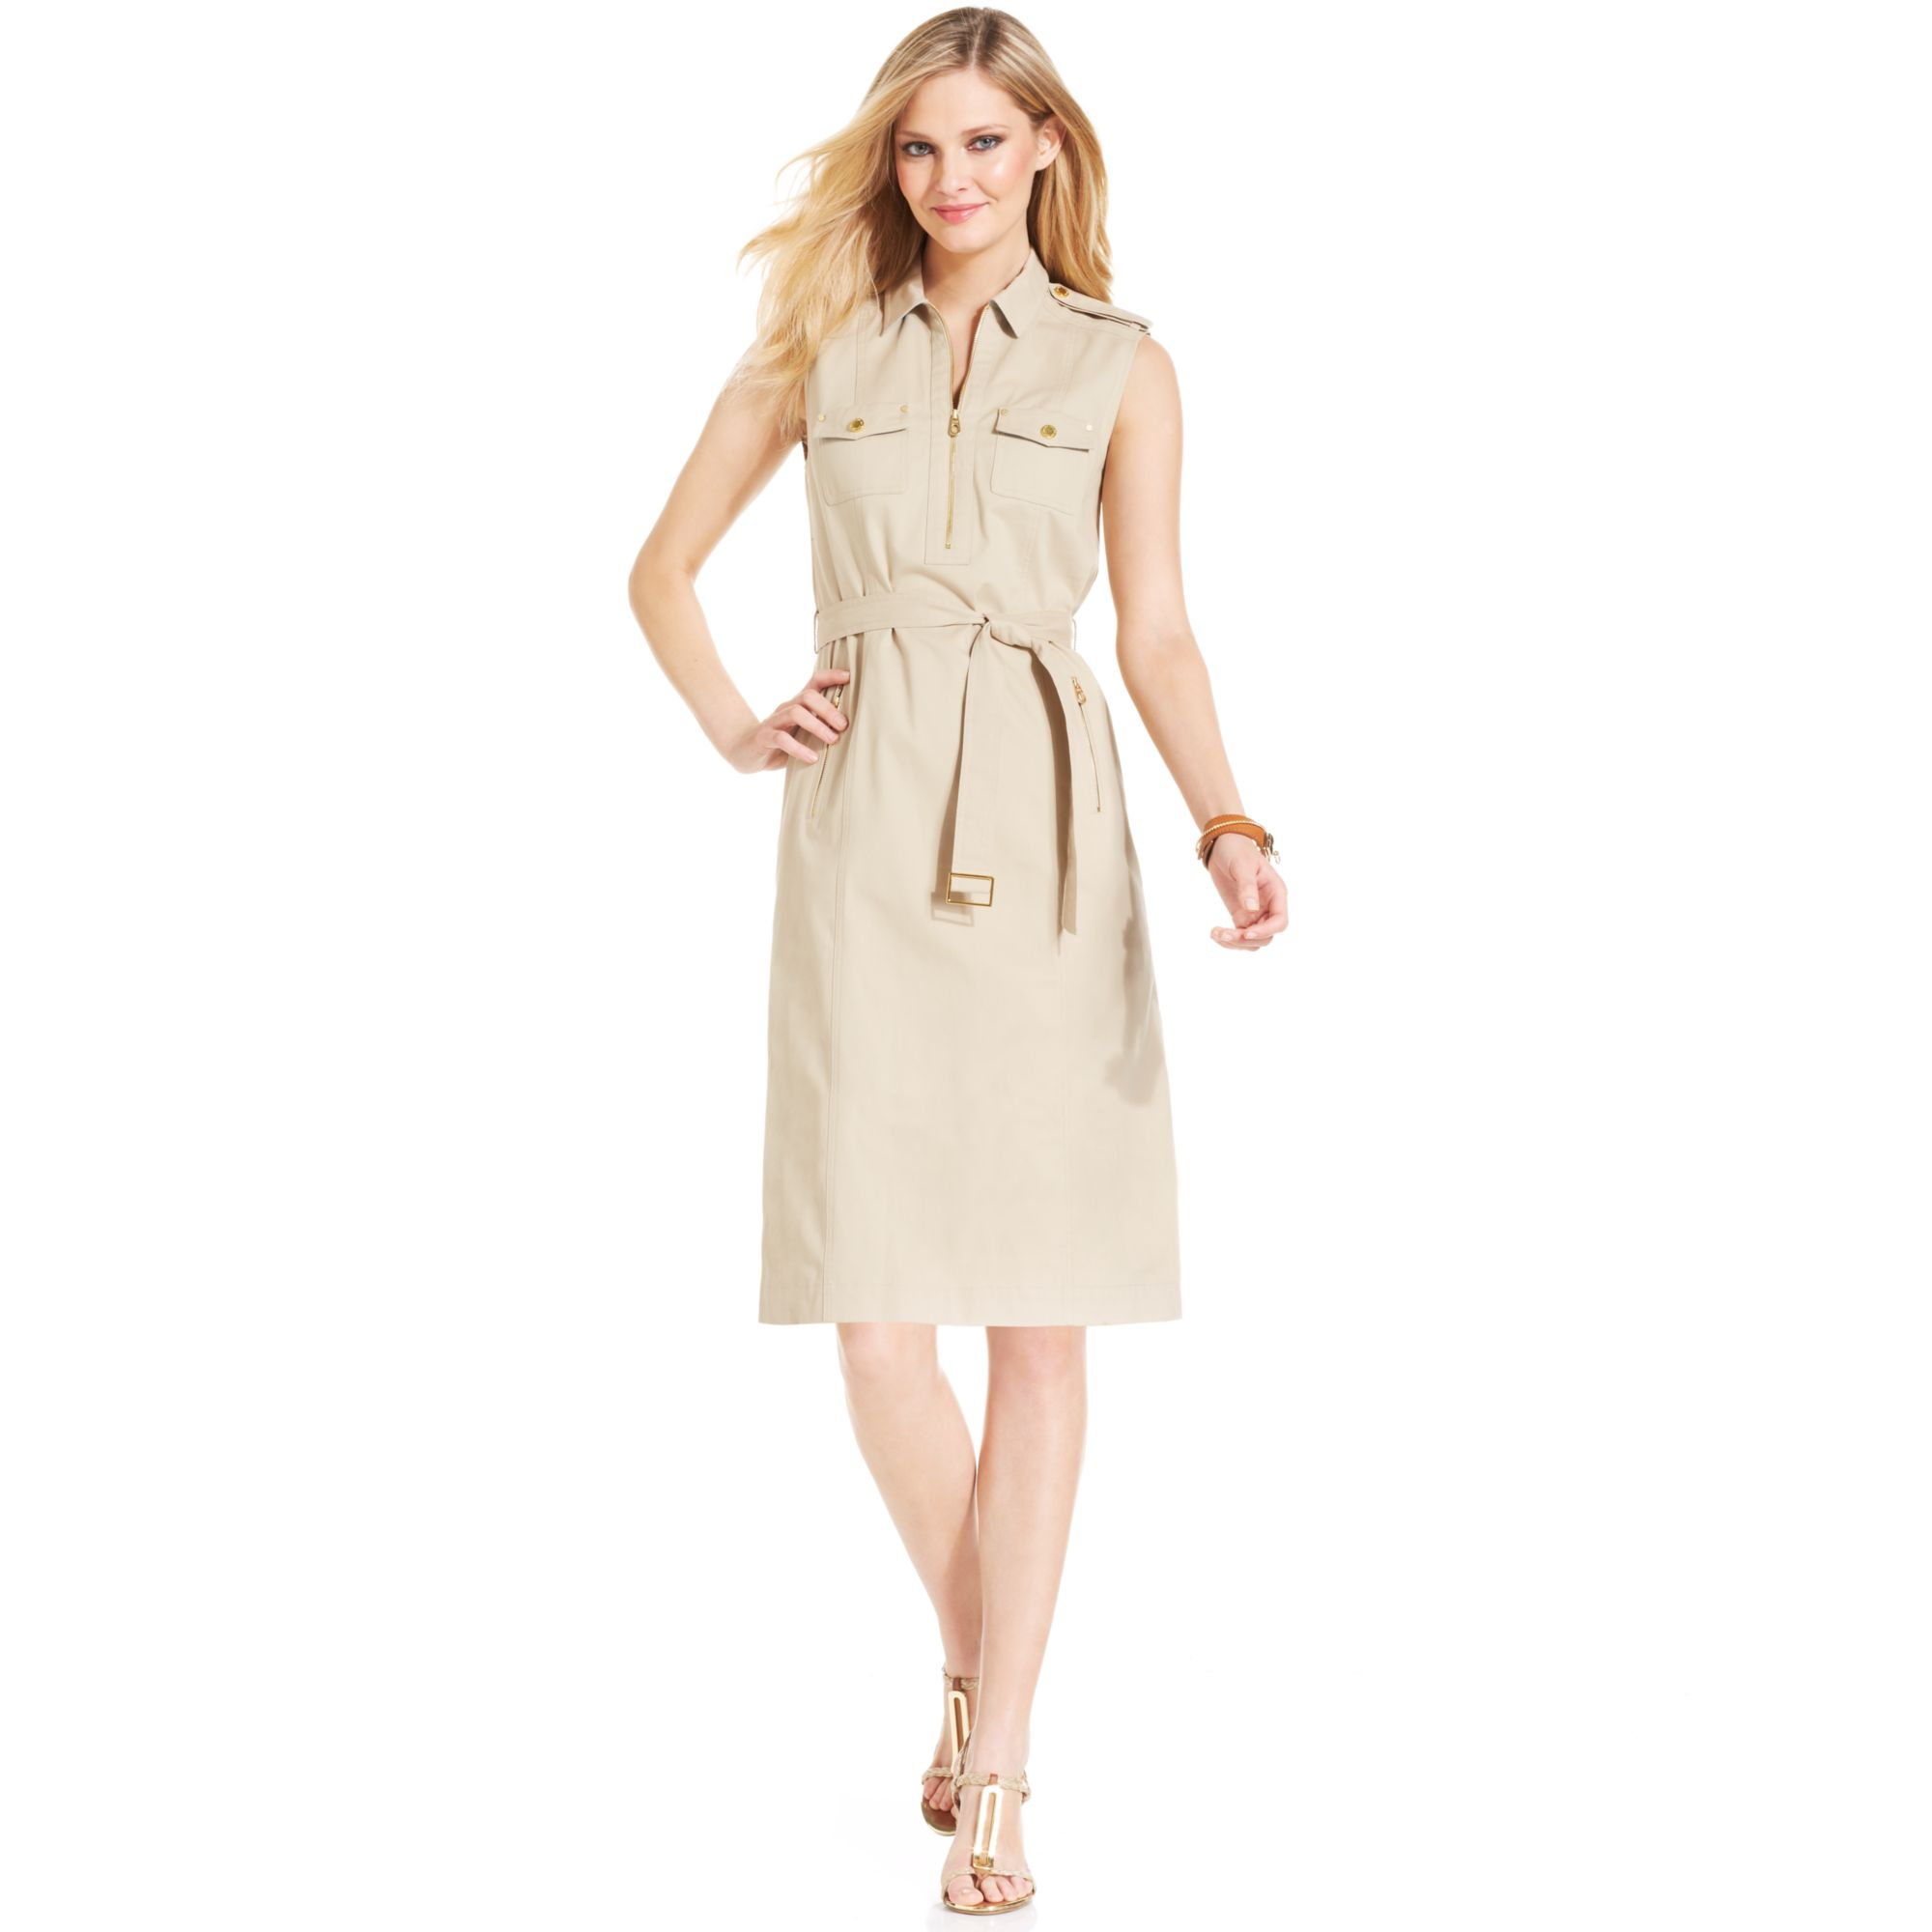 Jones New York Signature Petite Sleeveless Zippered Belted Dress in ...